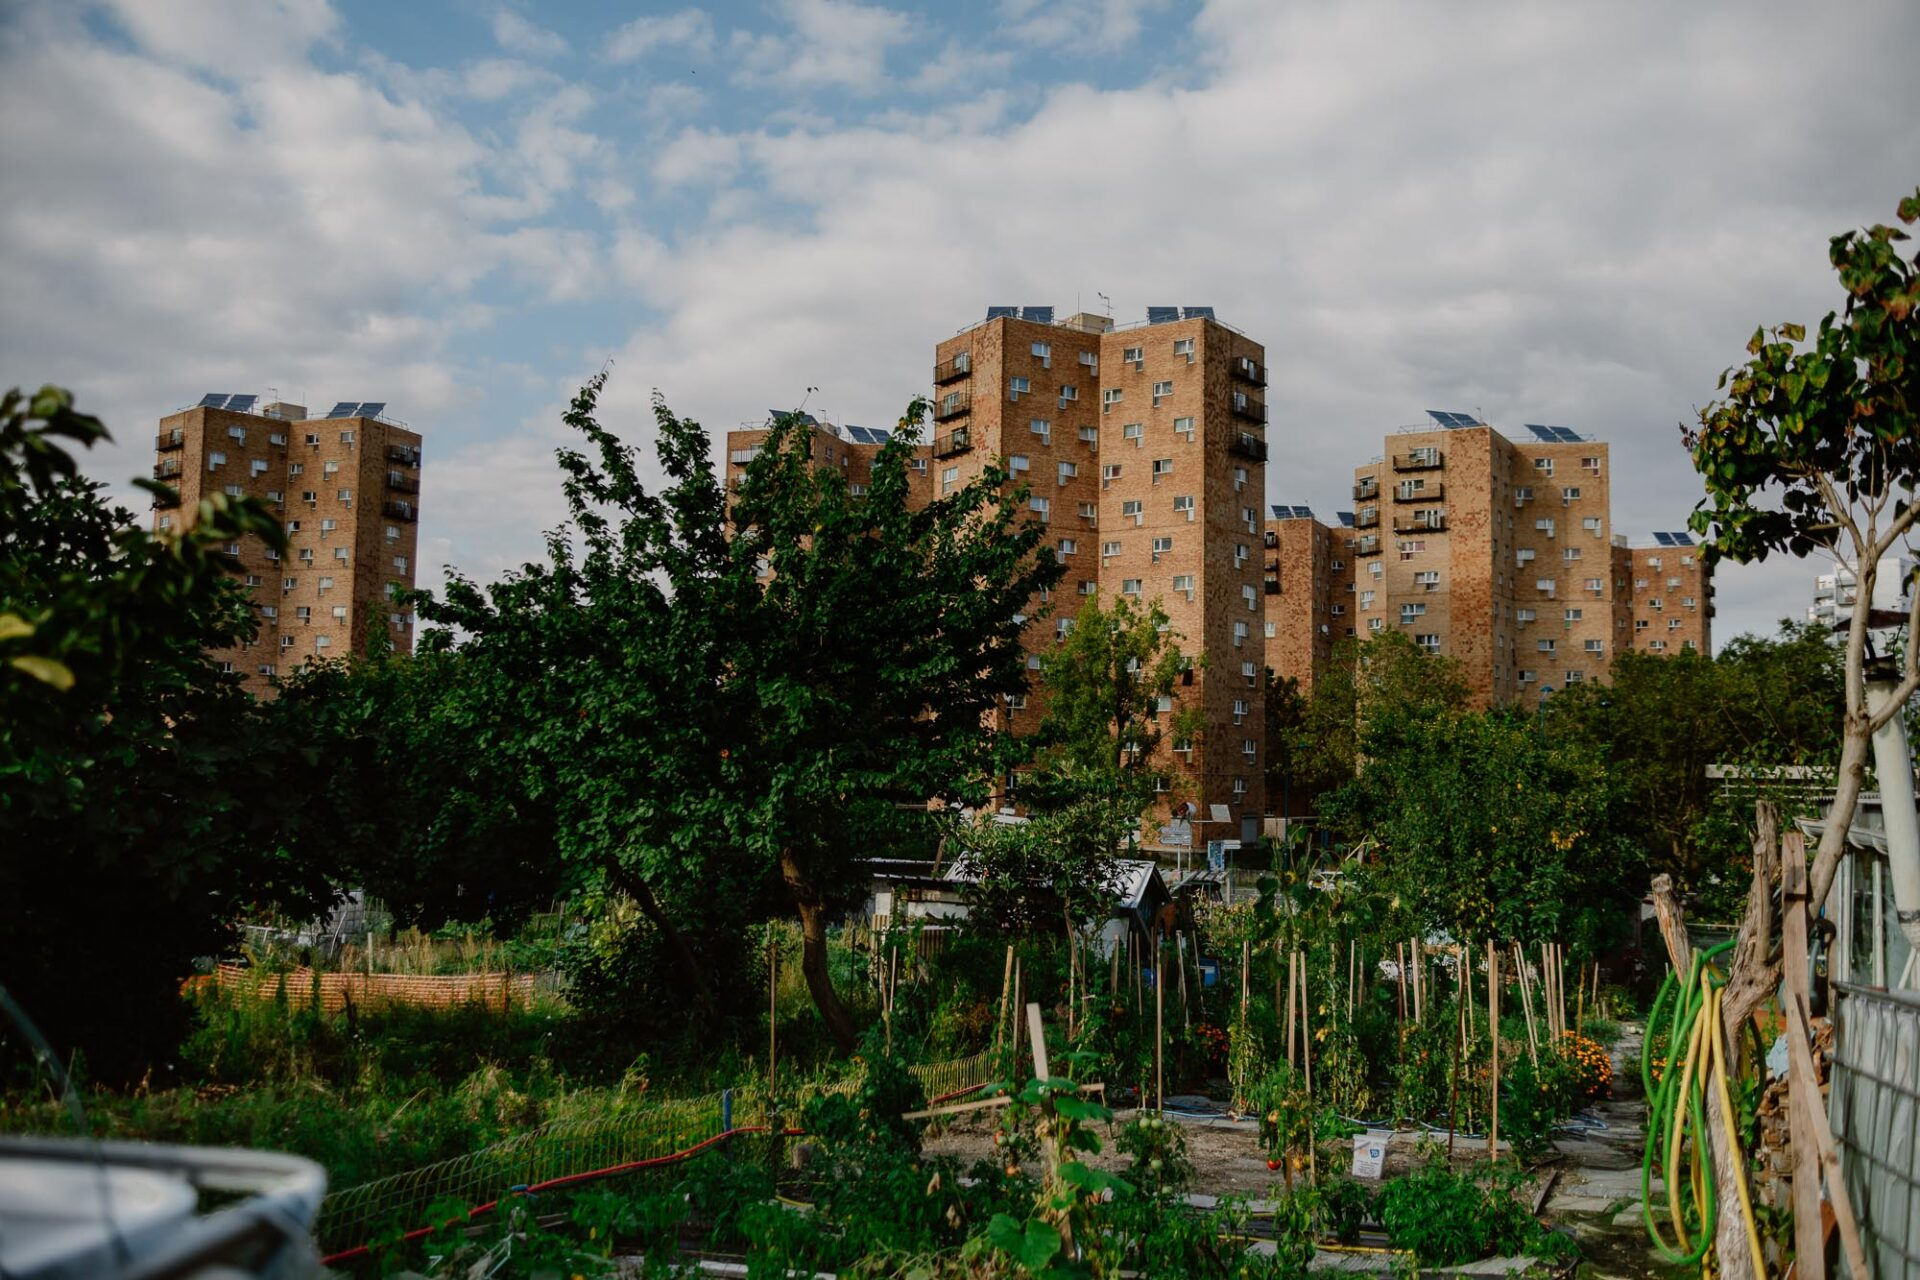 Jardins ouvriers aubervilliers 9 - Dagmara Bojenko - Eco-conscious Weddings, Births & Families